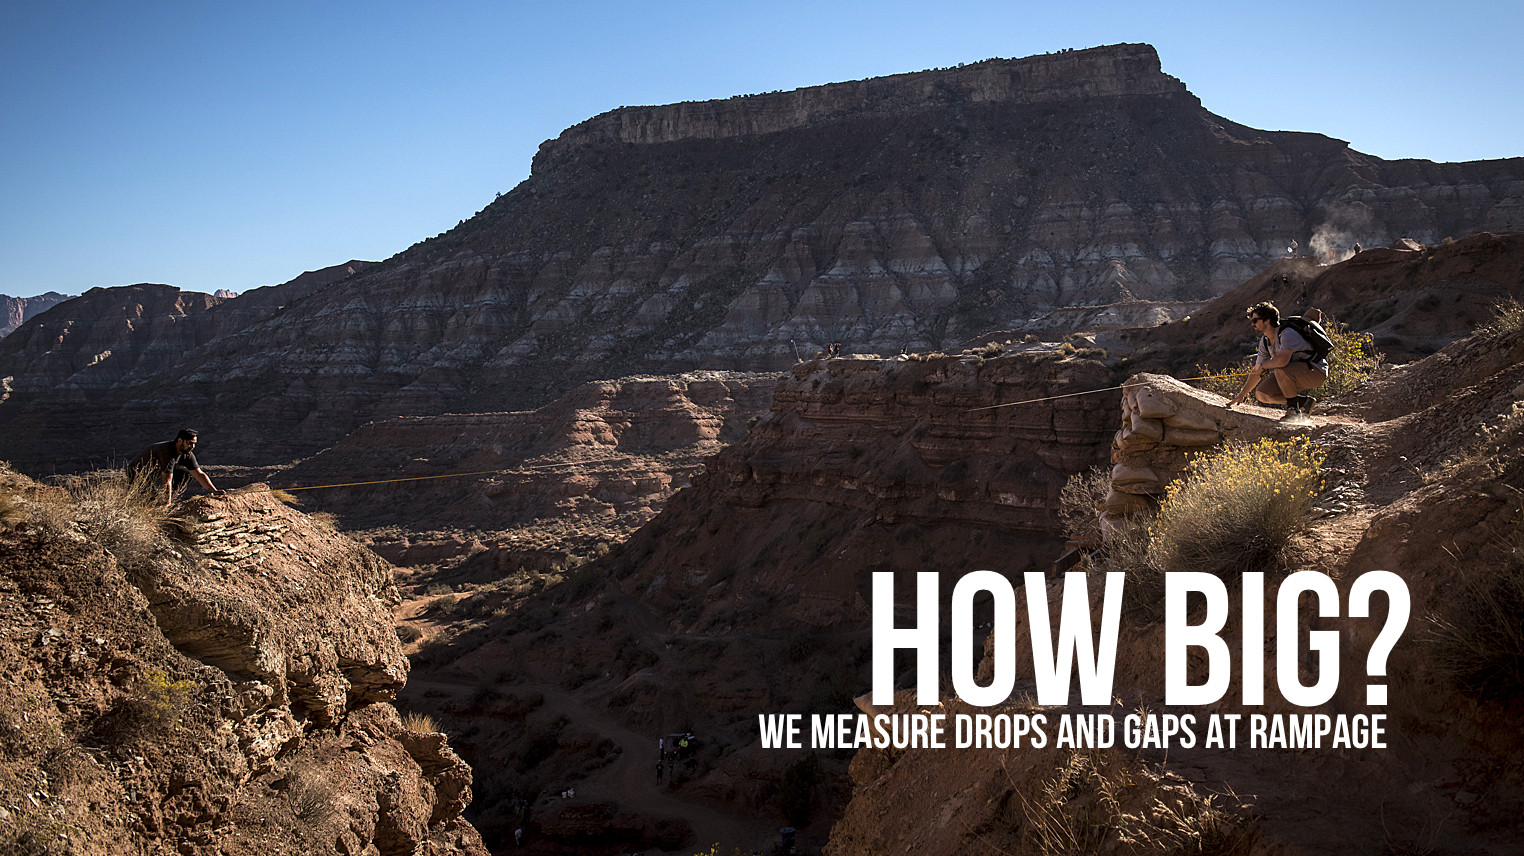 HOW BIG? We measure drops and gaps at Rampage 2015 - HOW BIG? We measure drops and gaps at Rampage 2015 - Mountain Biking Pictures - Vital MTB